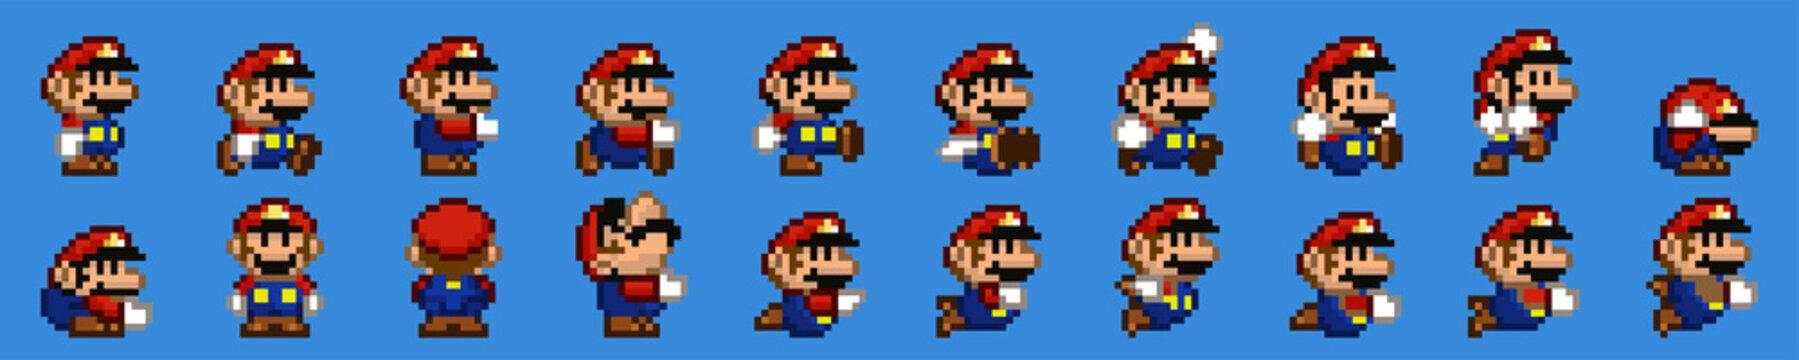 TASHKENT, UZBEKISTAN - NOVEMBER 9, 2020: Super Mario World pixelated retro video game. Mario character set of poses. Pixel art vector illustration. Old school of games